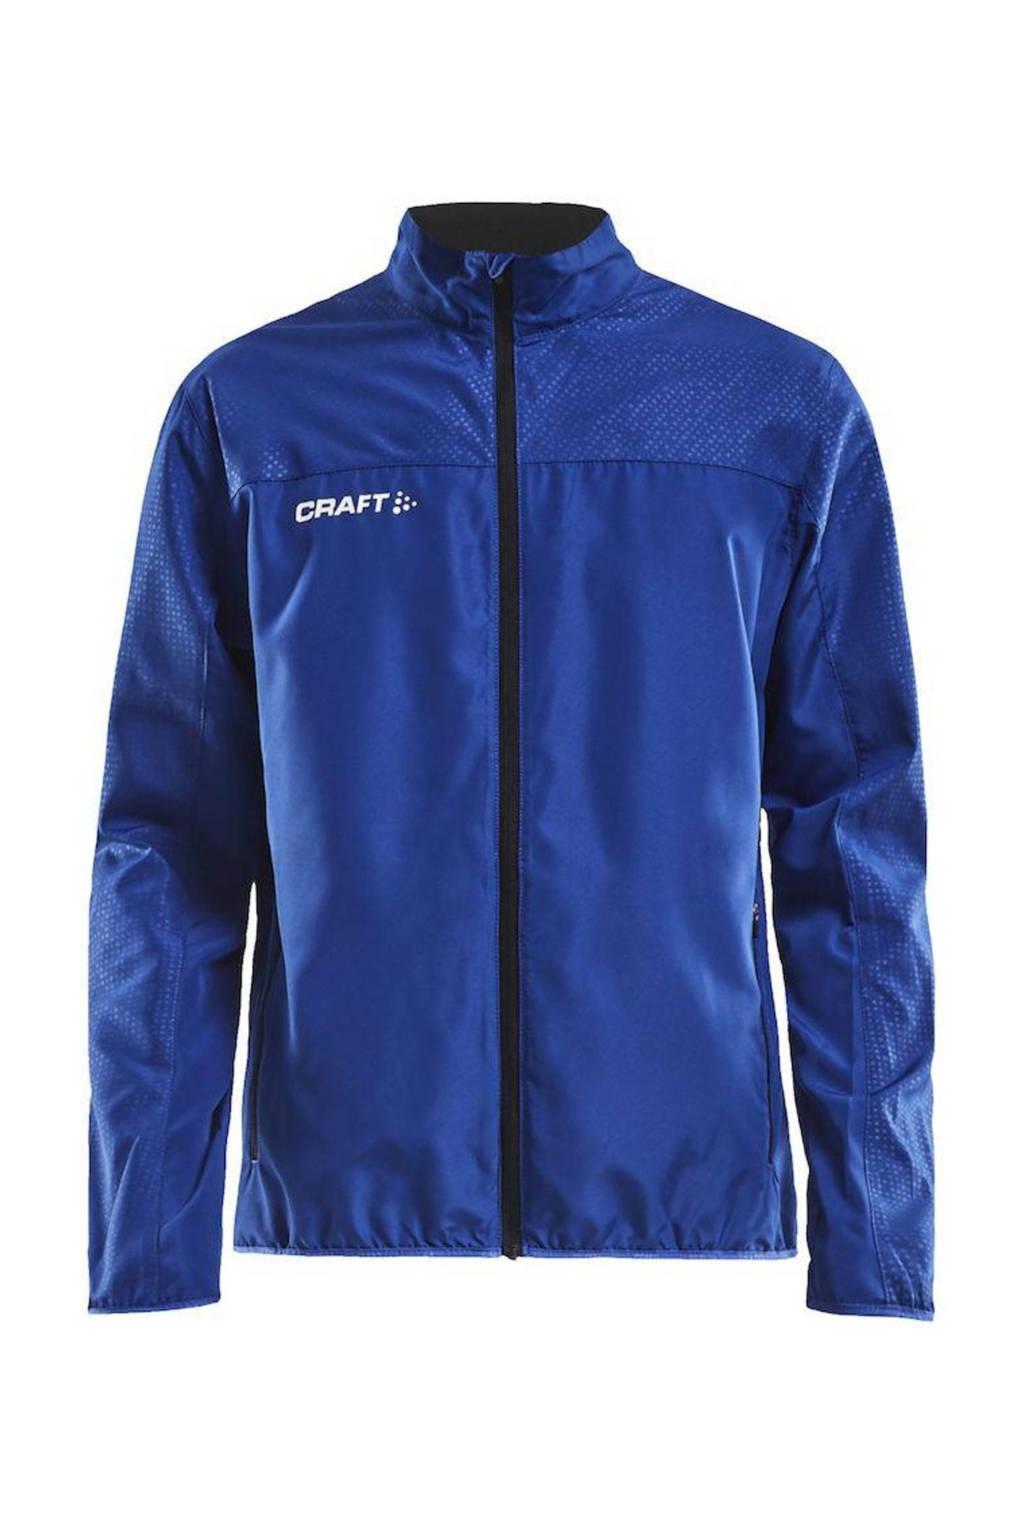 Craft   sportjack Rush Wind kobaltblauw, Kobaltblauw